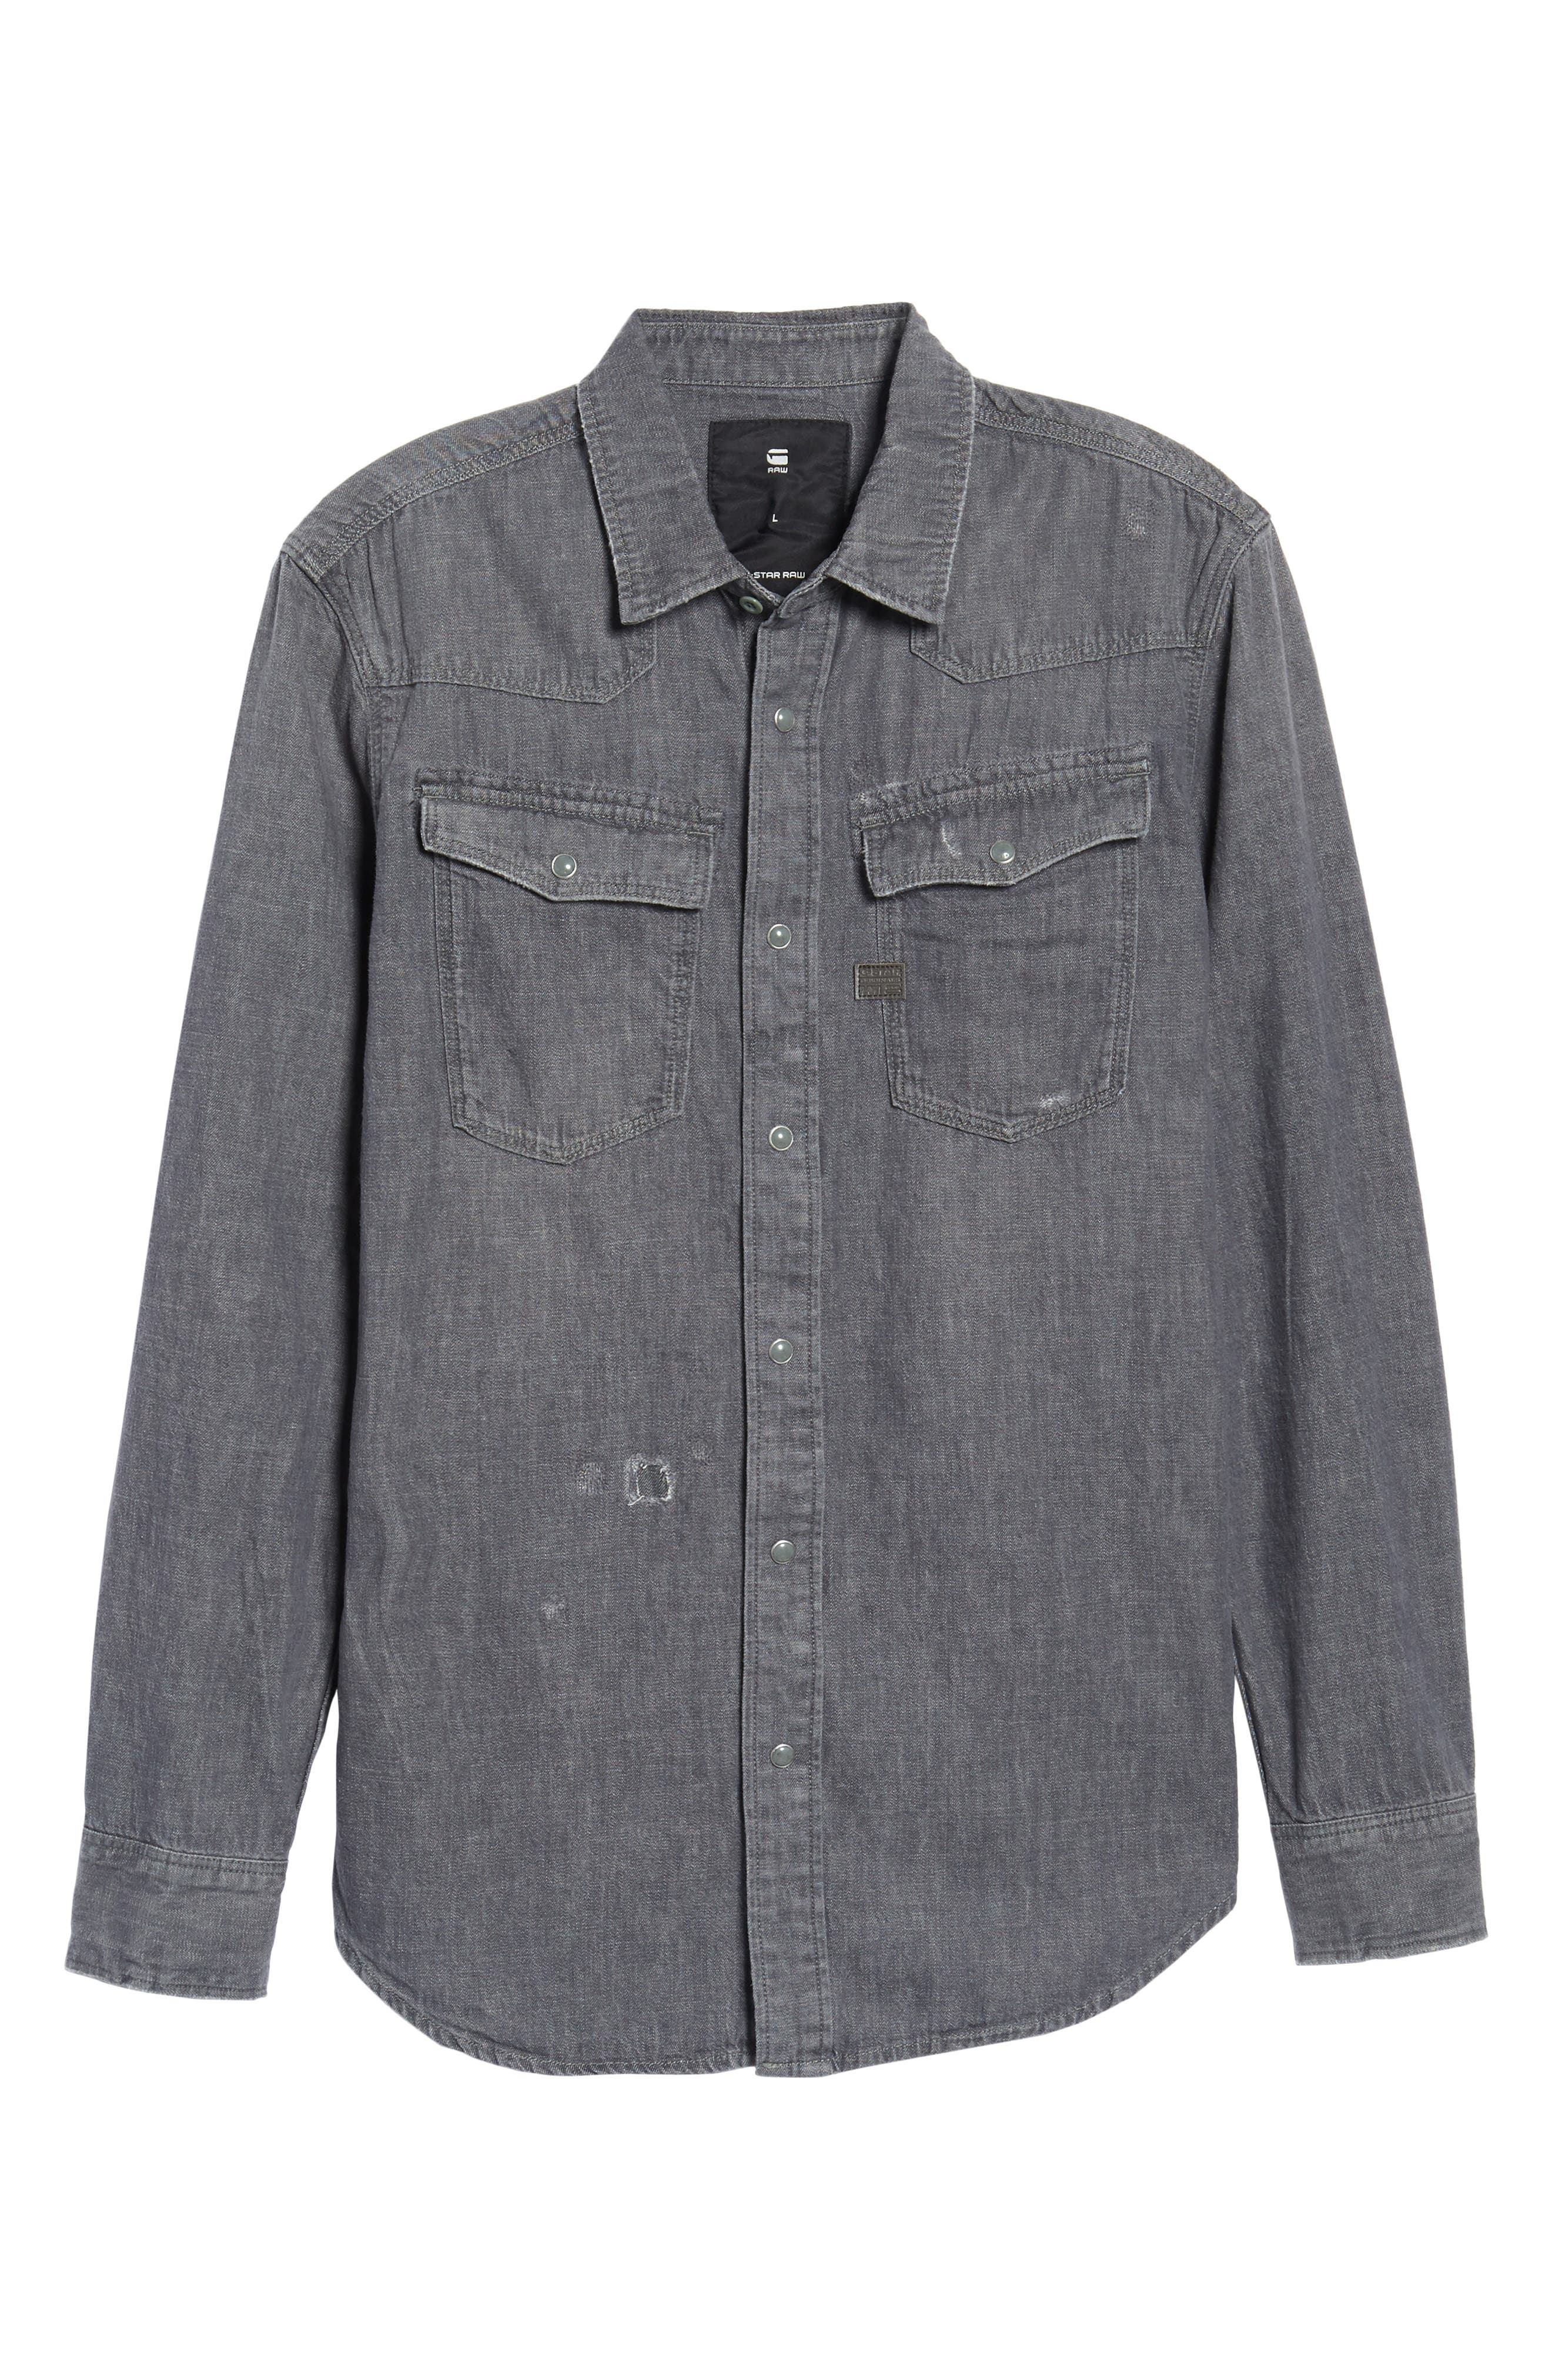 3301 Craser Denim Shirt,                             Alternate thumbnail 6, color,                             025